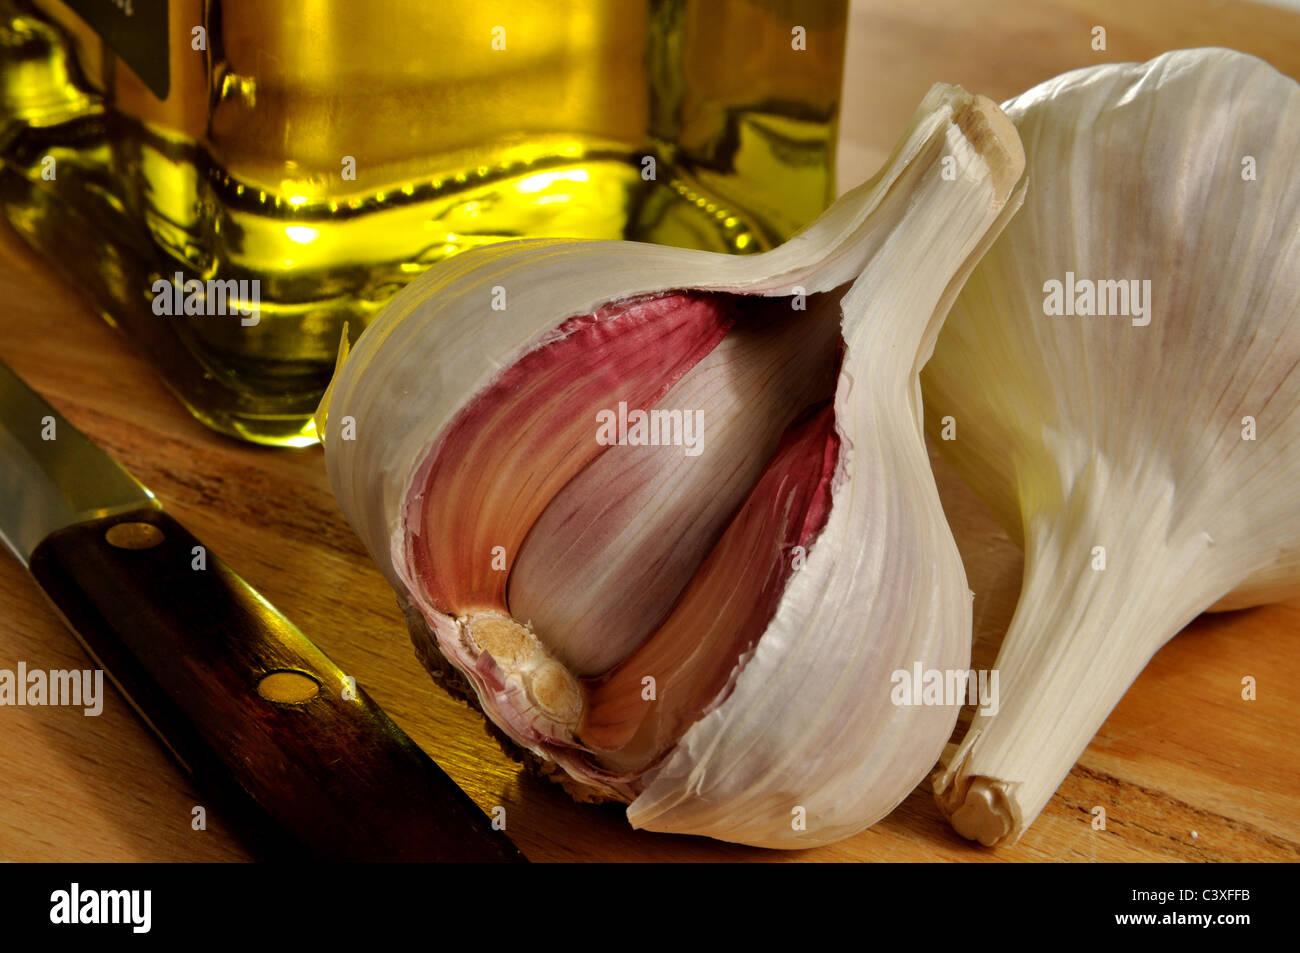 Garlic bulbs - Stock Image